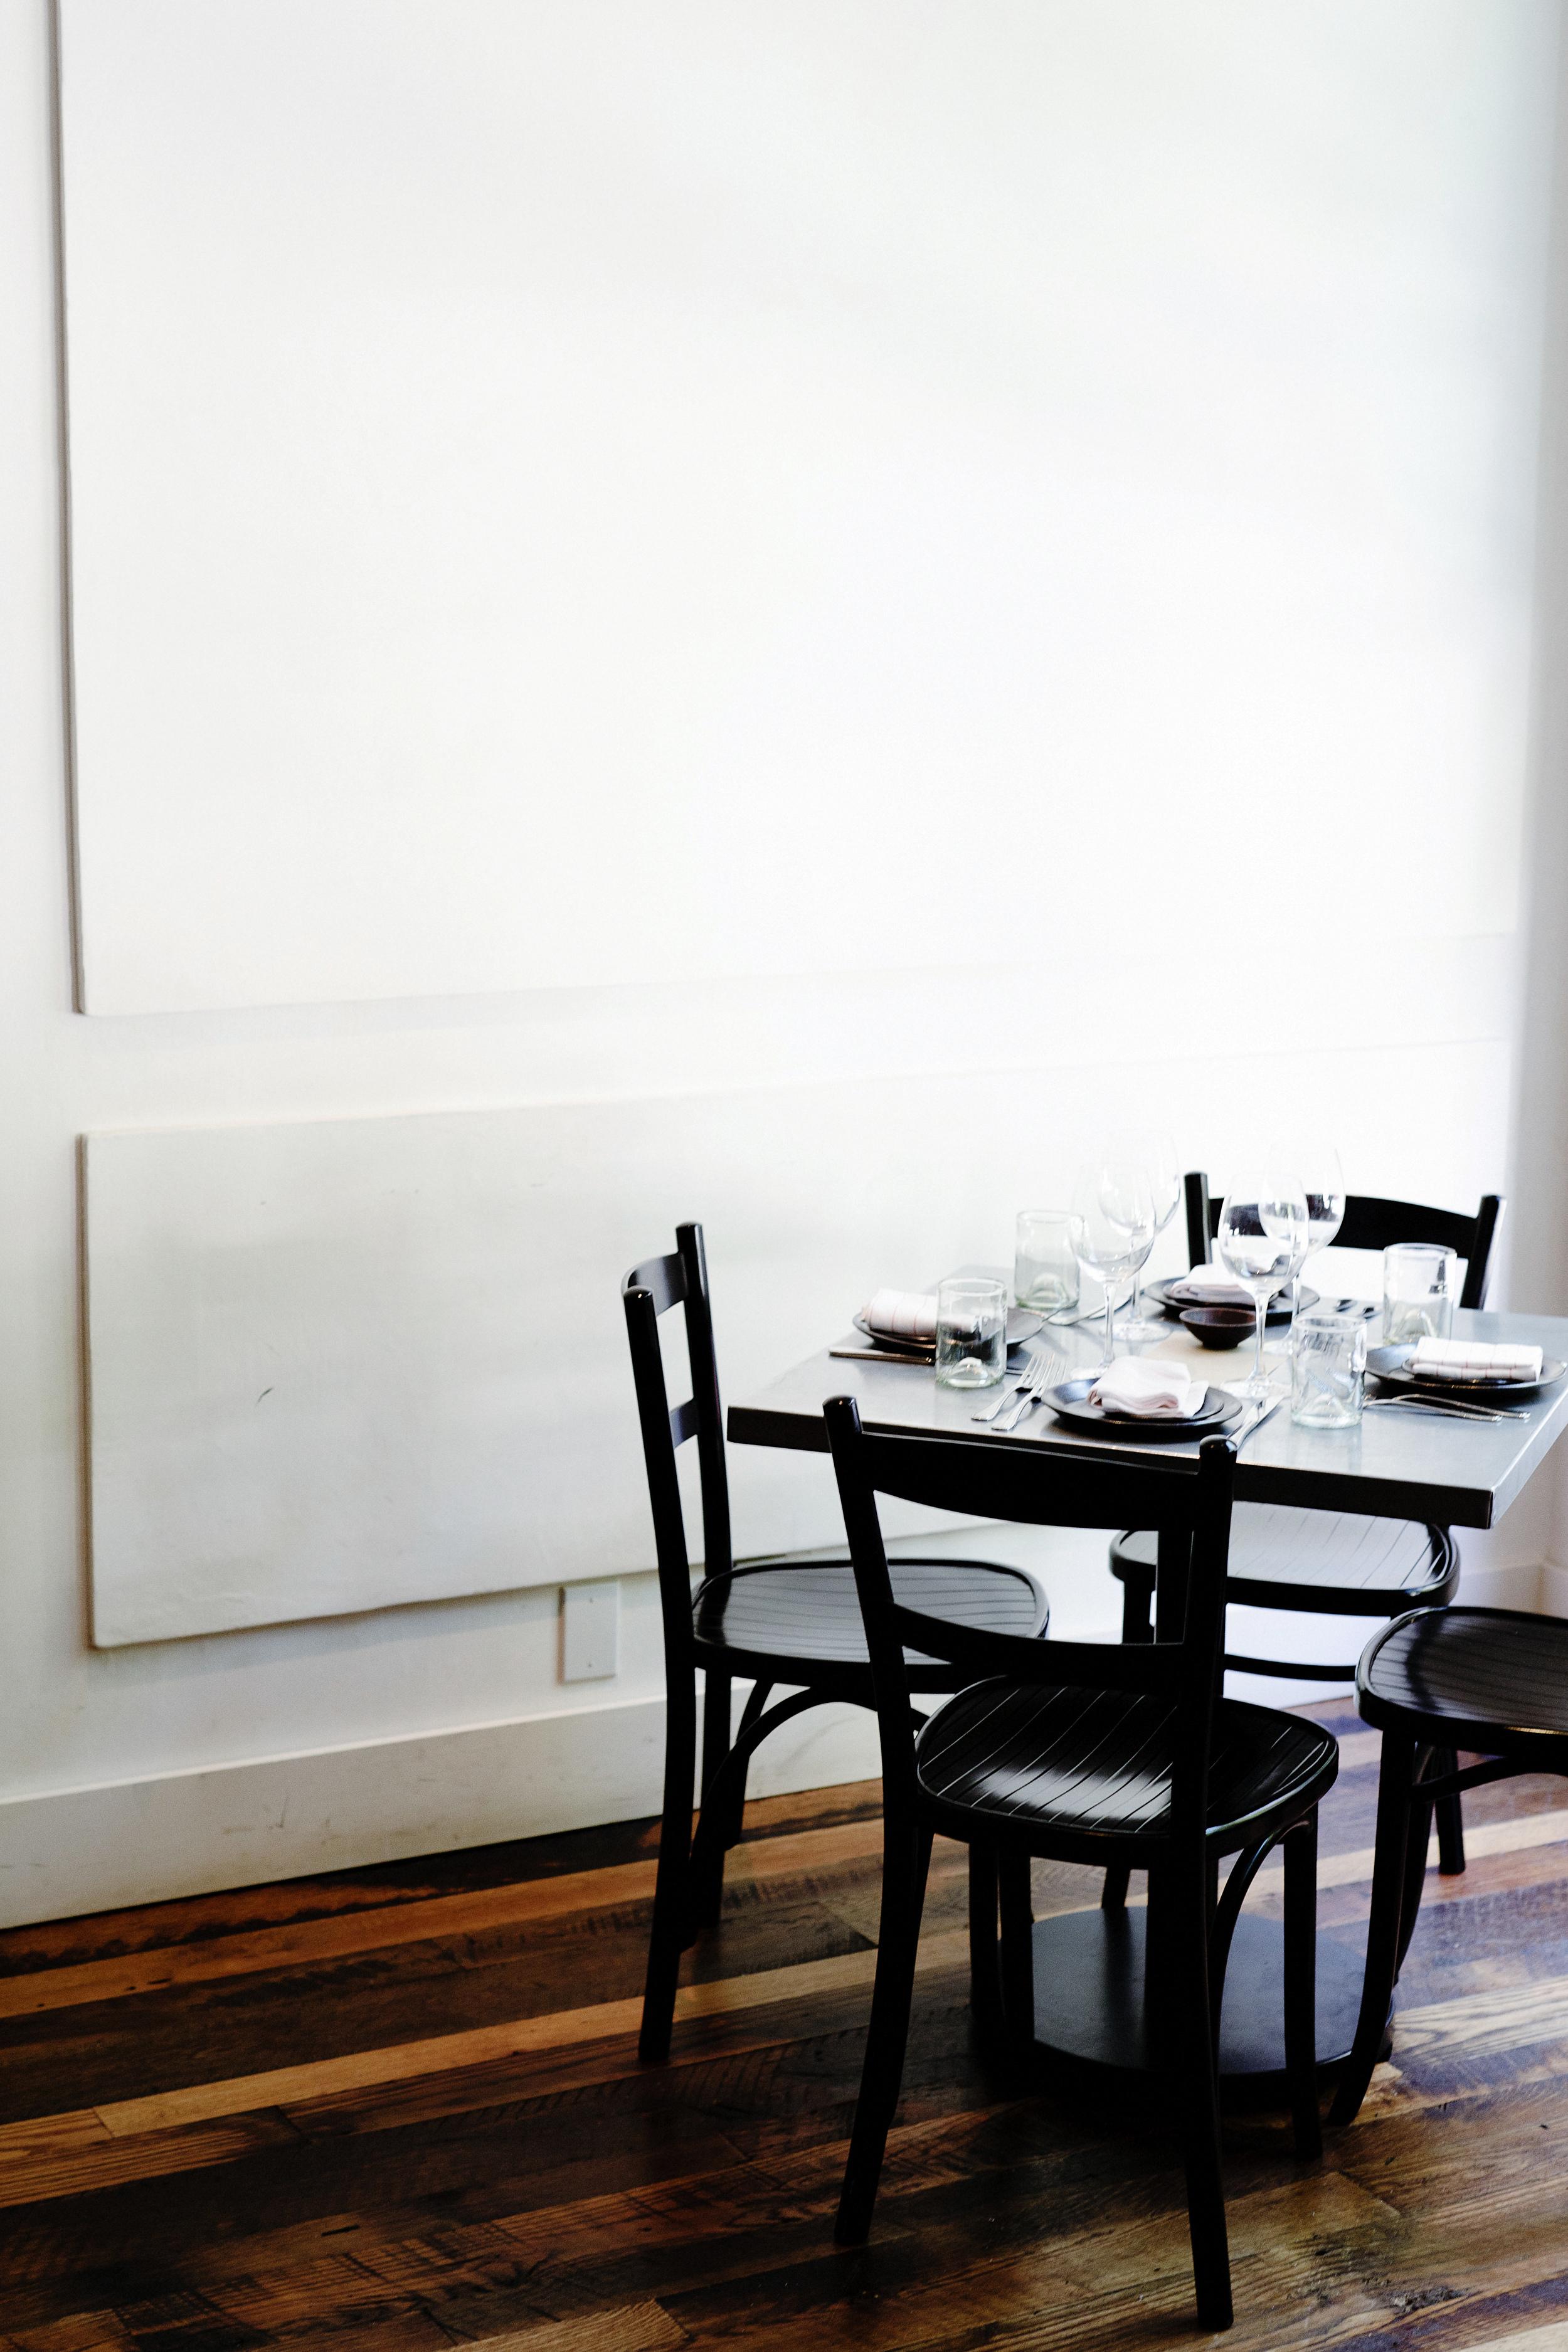 No.246 | Smith Hanes. restaurant interior seating